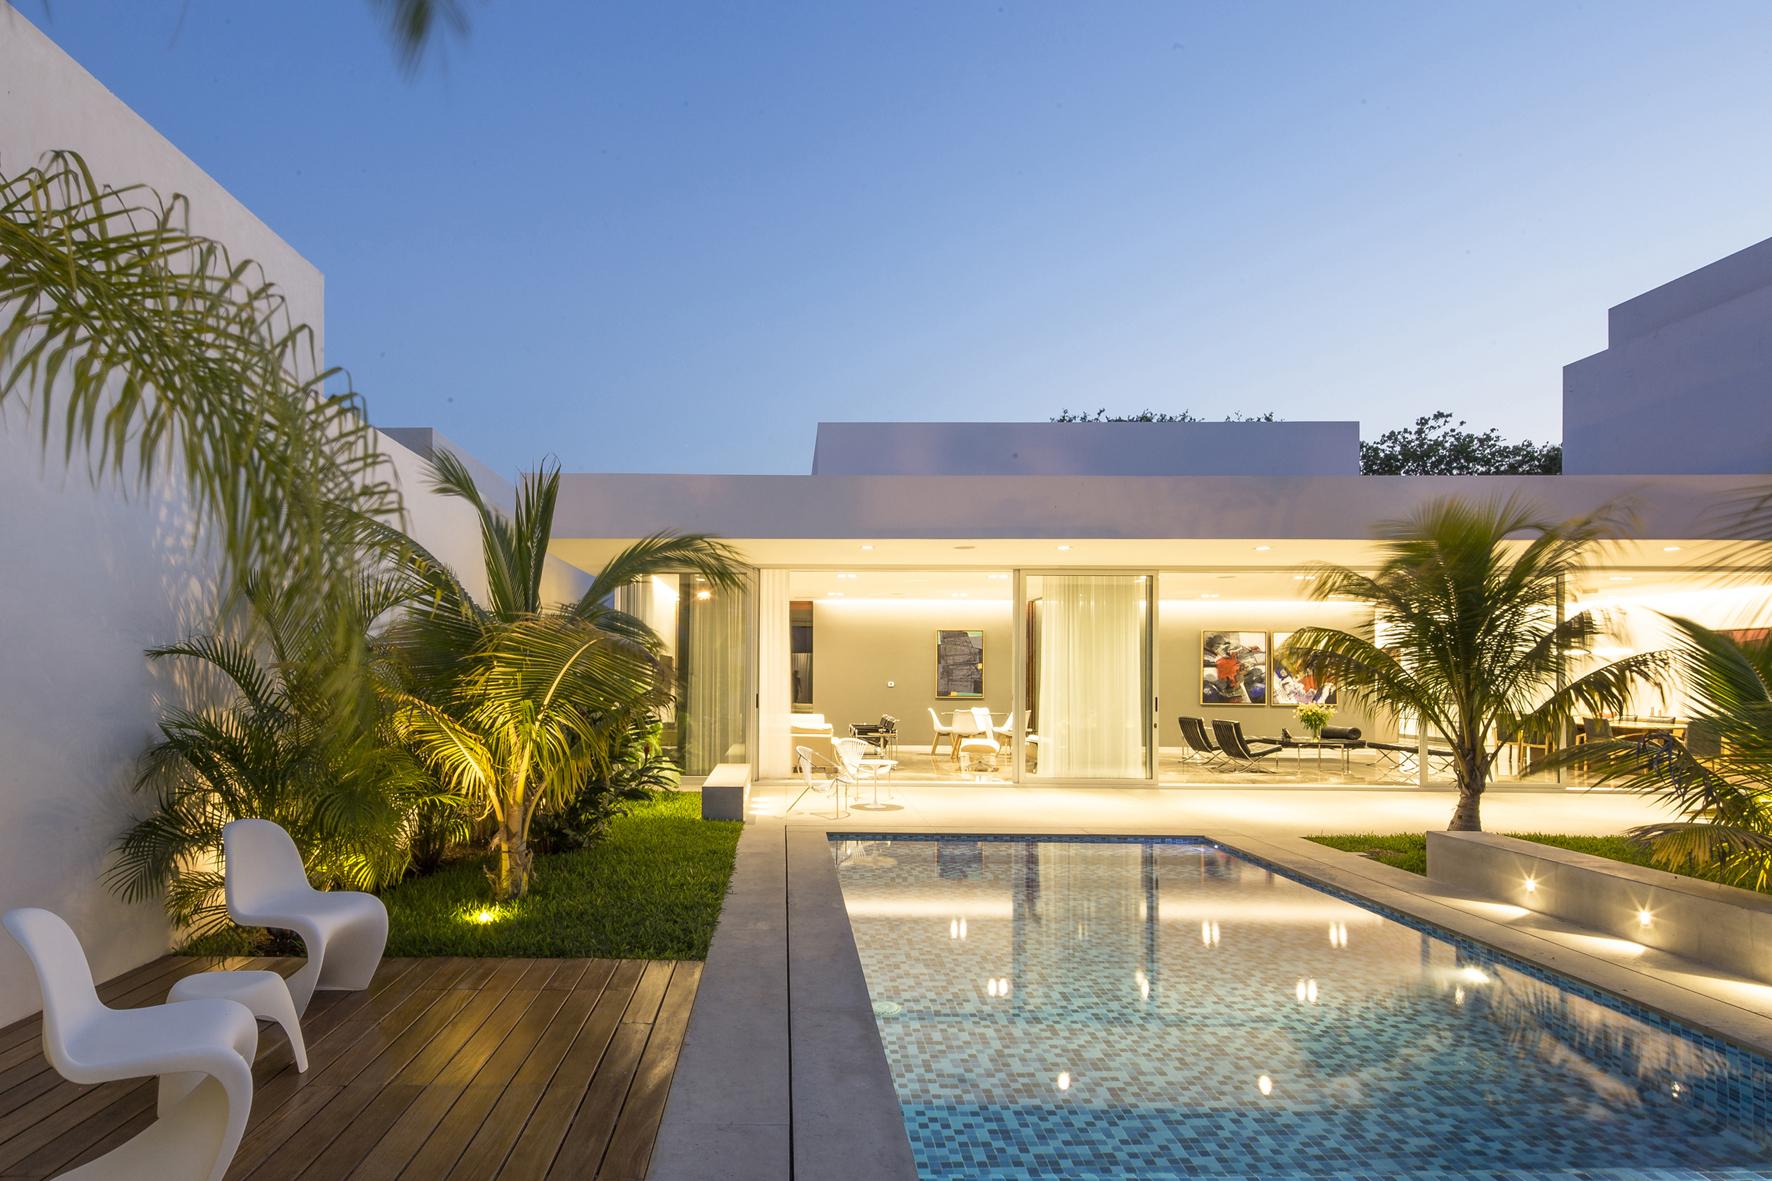 Gallery of Ancha House / Augusto Quijano Arquitectos - 6